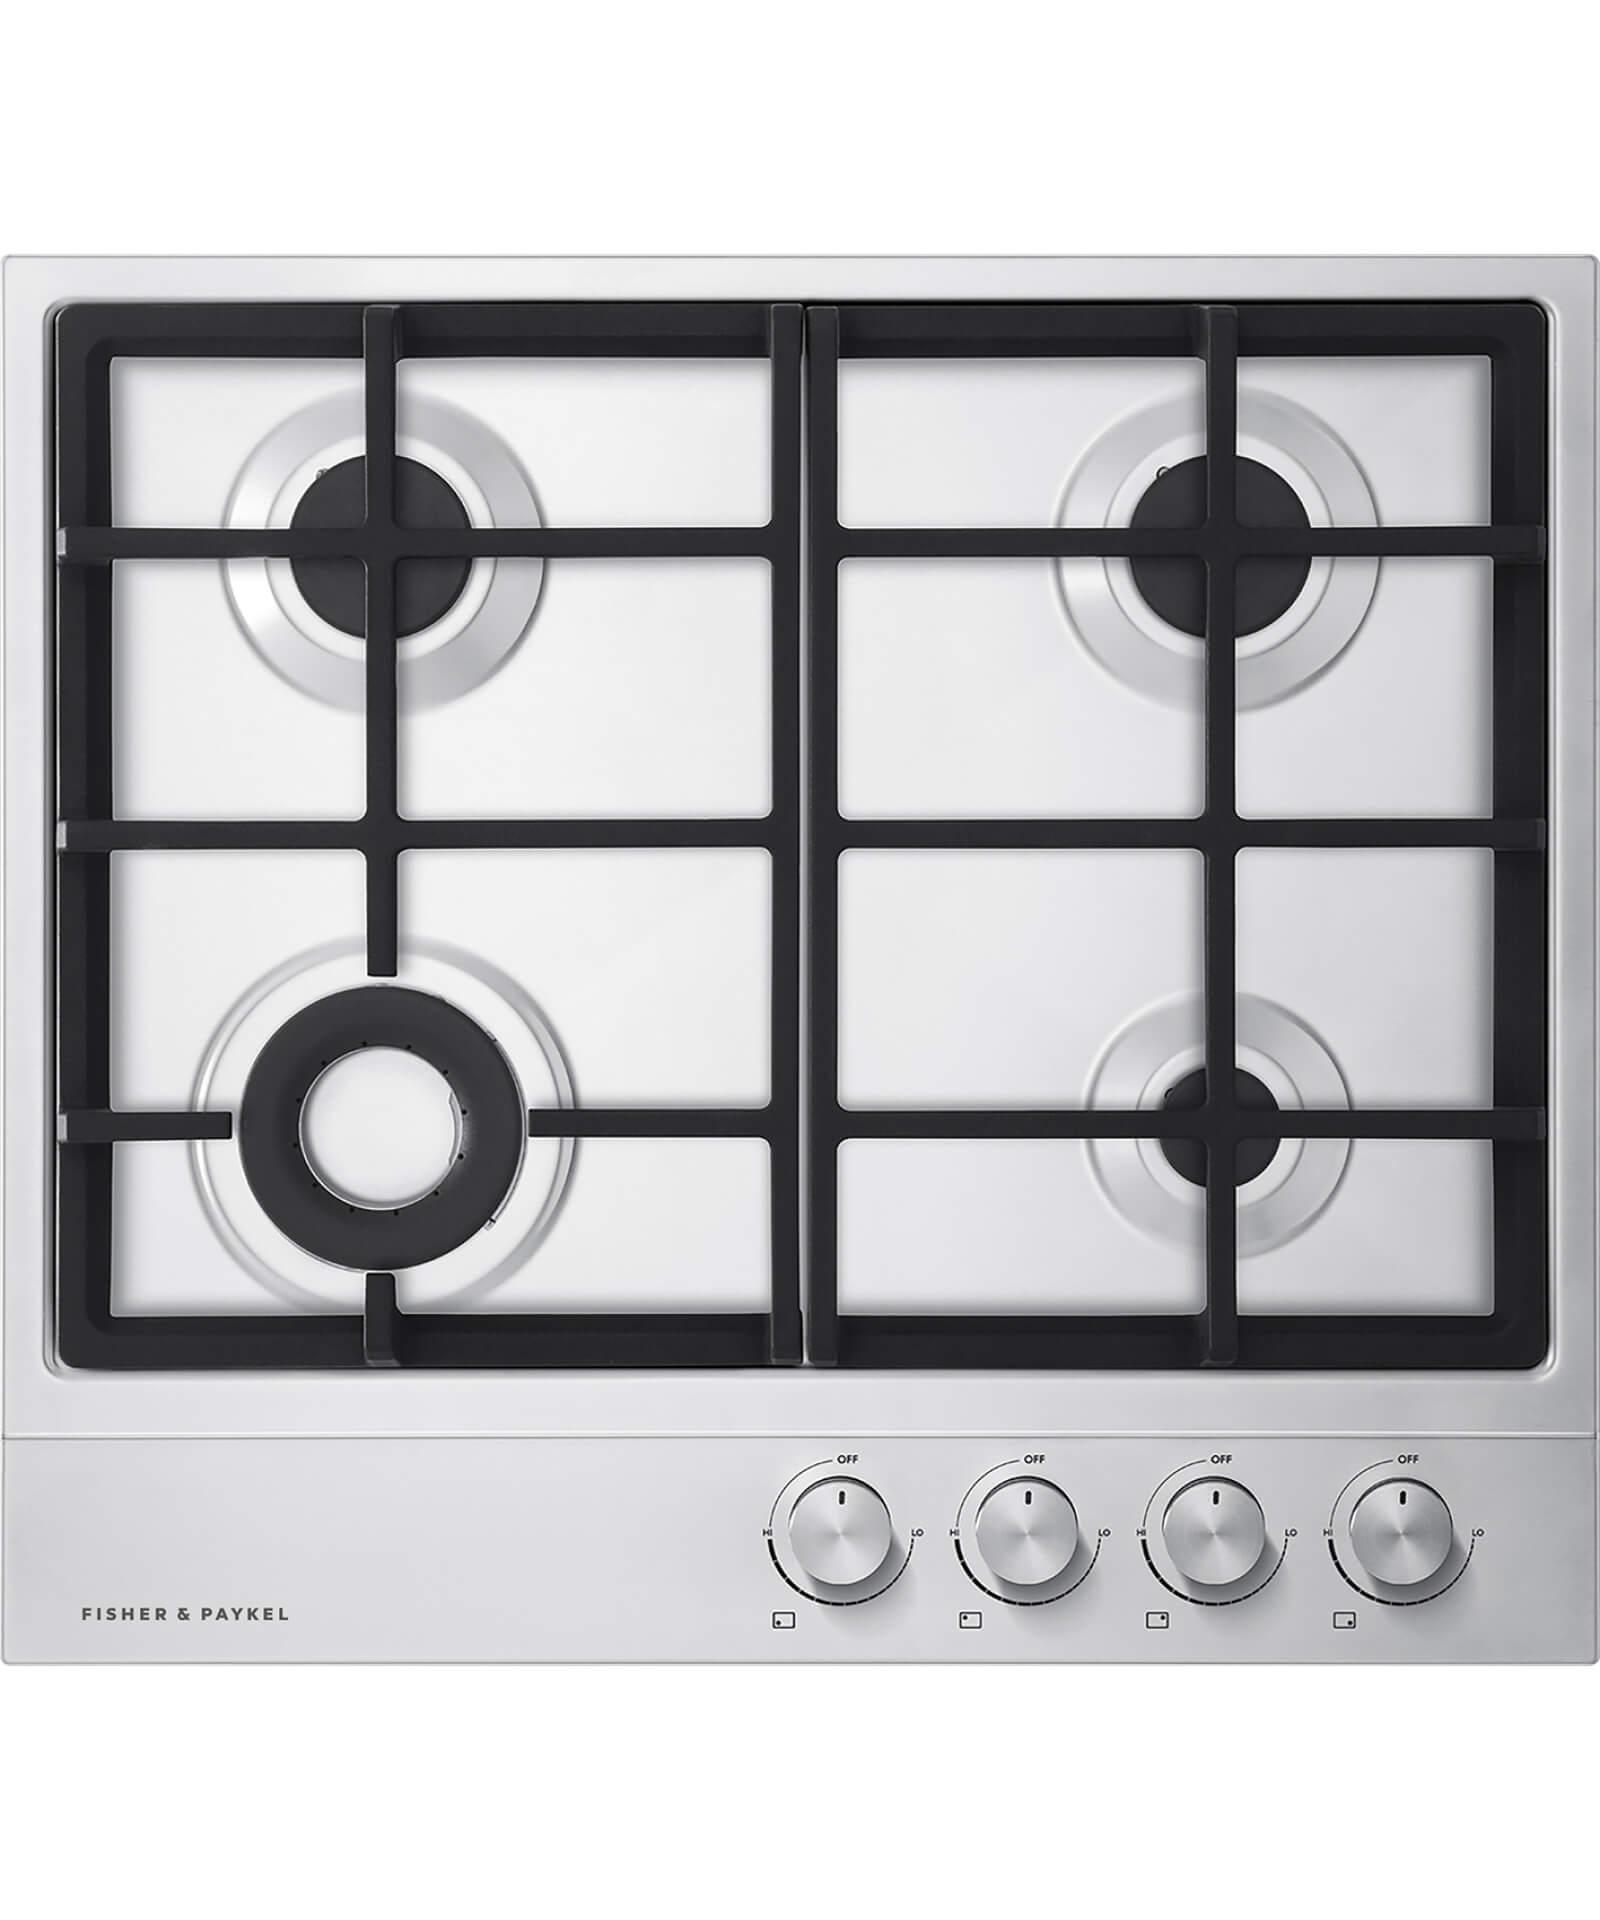 Cg244dngx1 N 24 4 Burner Gas Cooktop 81461